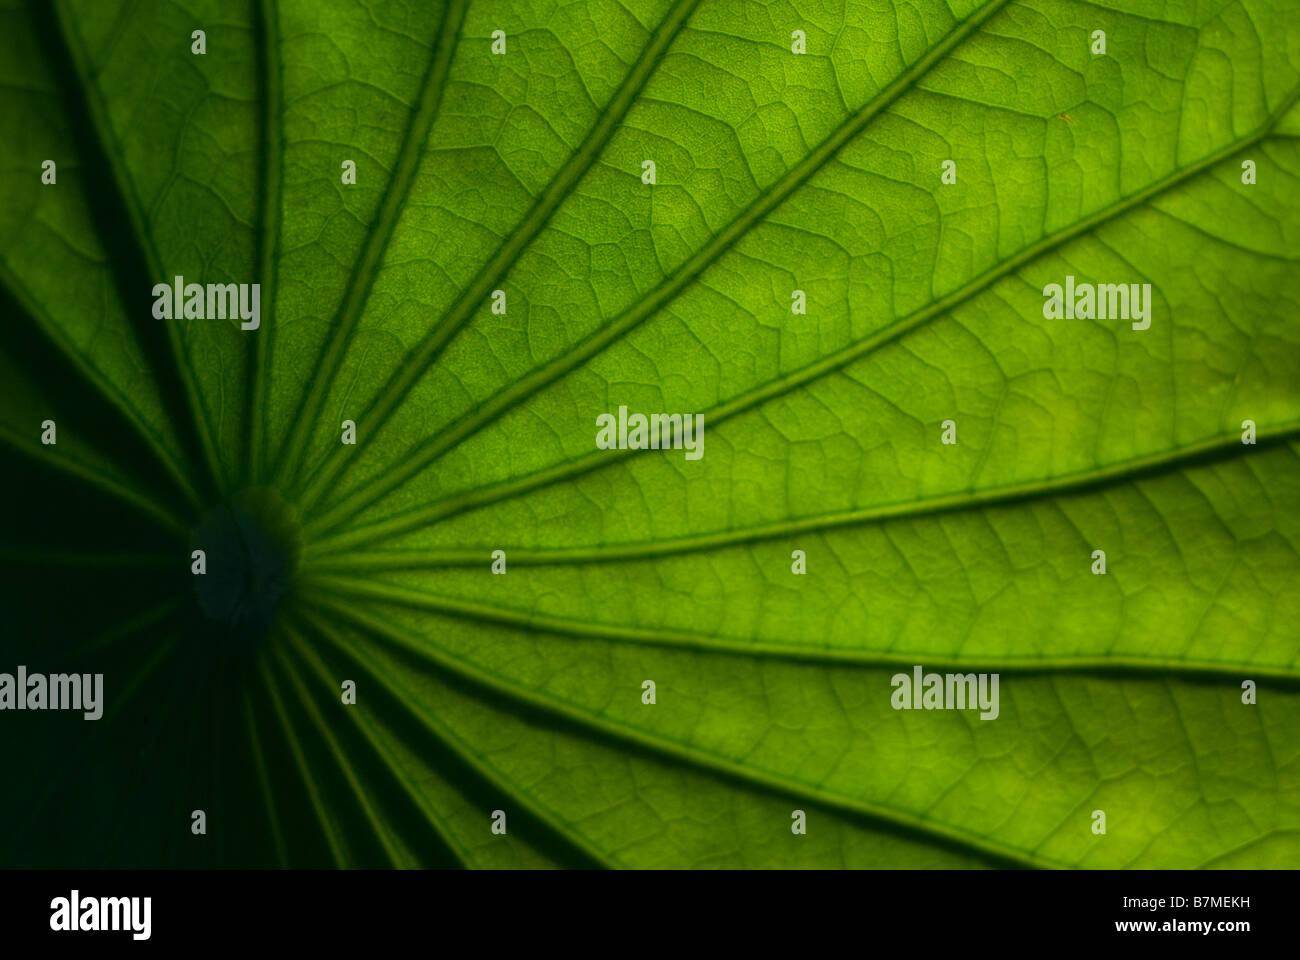 Lotusblatt Stockbild